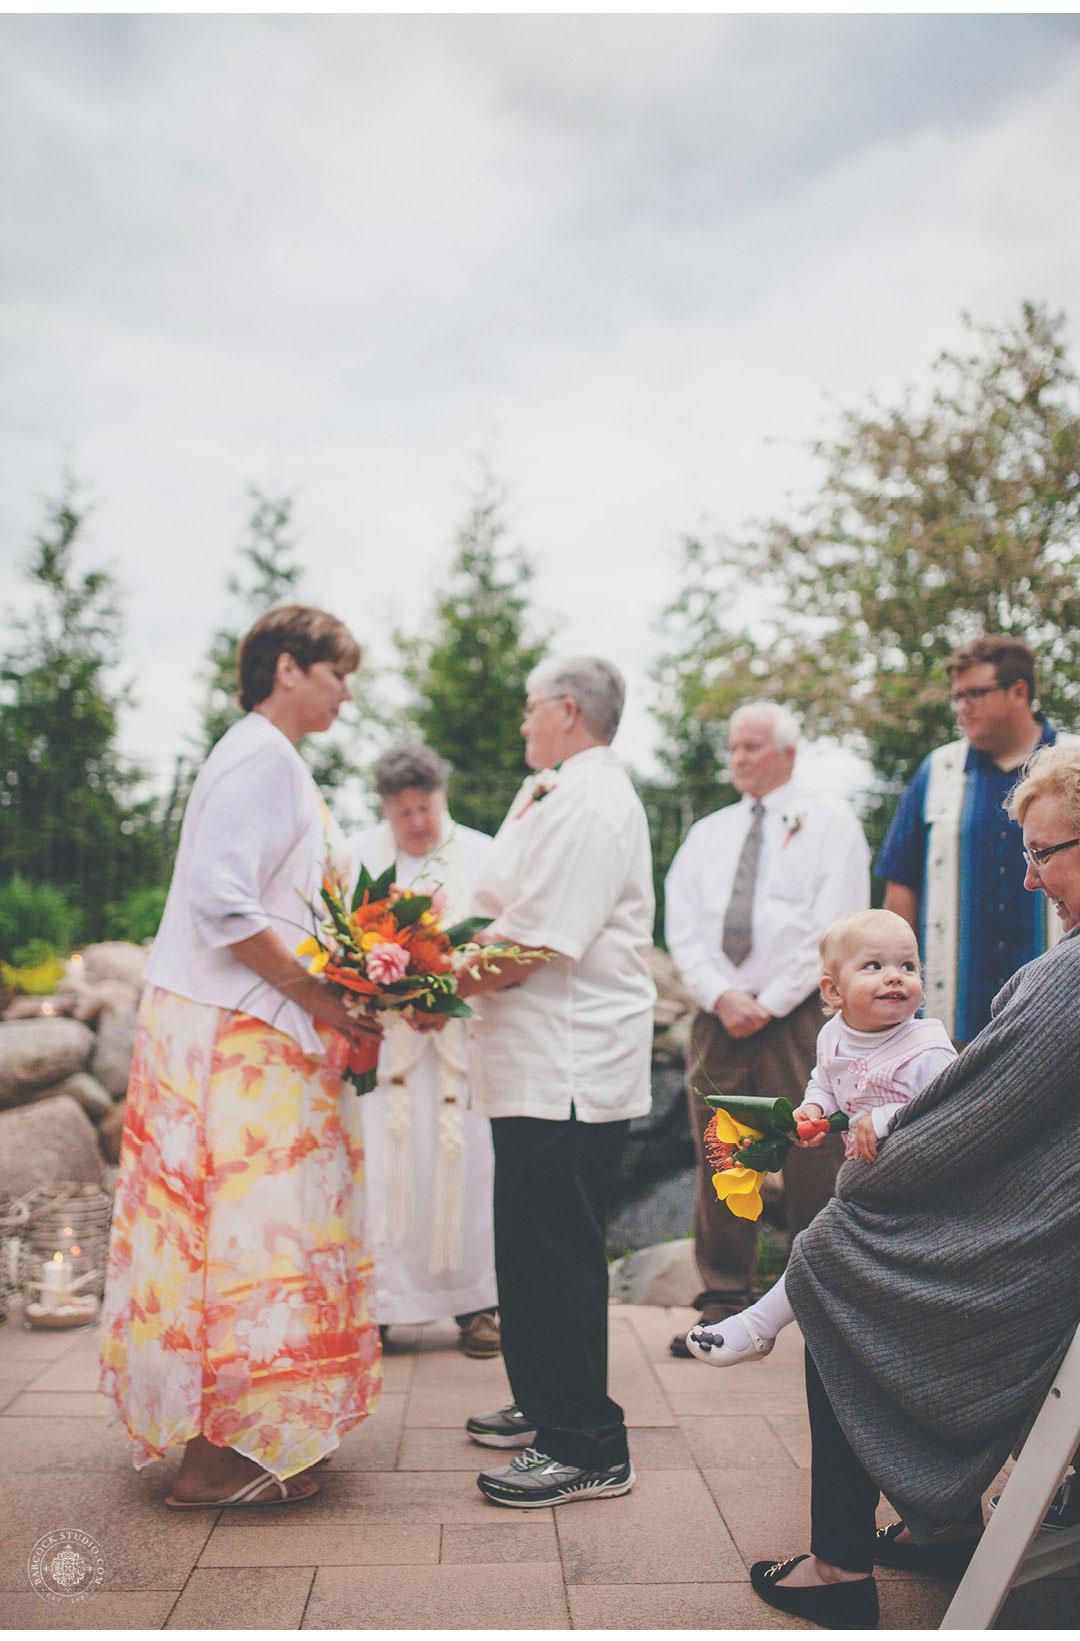 stacy-linda-wedding-dayton-photographer-dayton-ohio-13.jpg